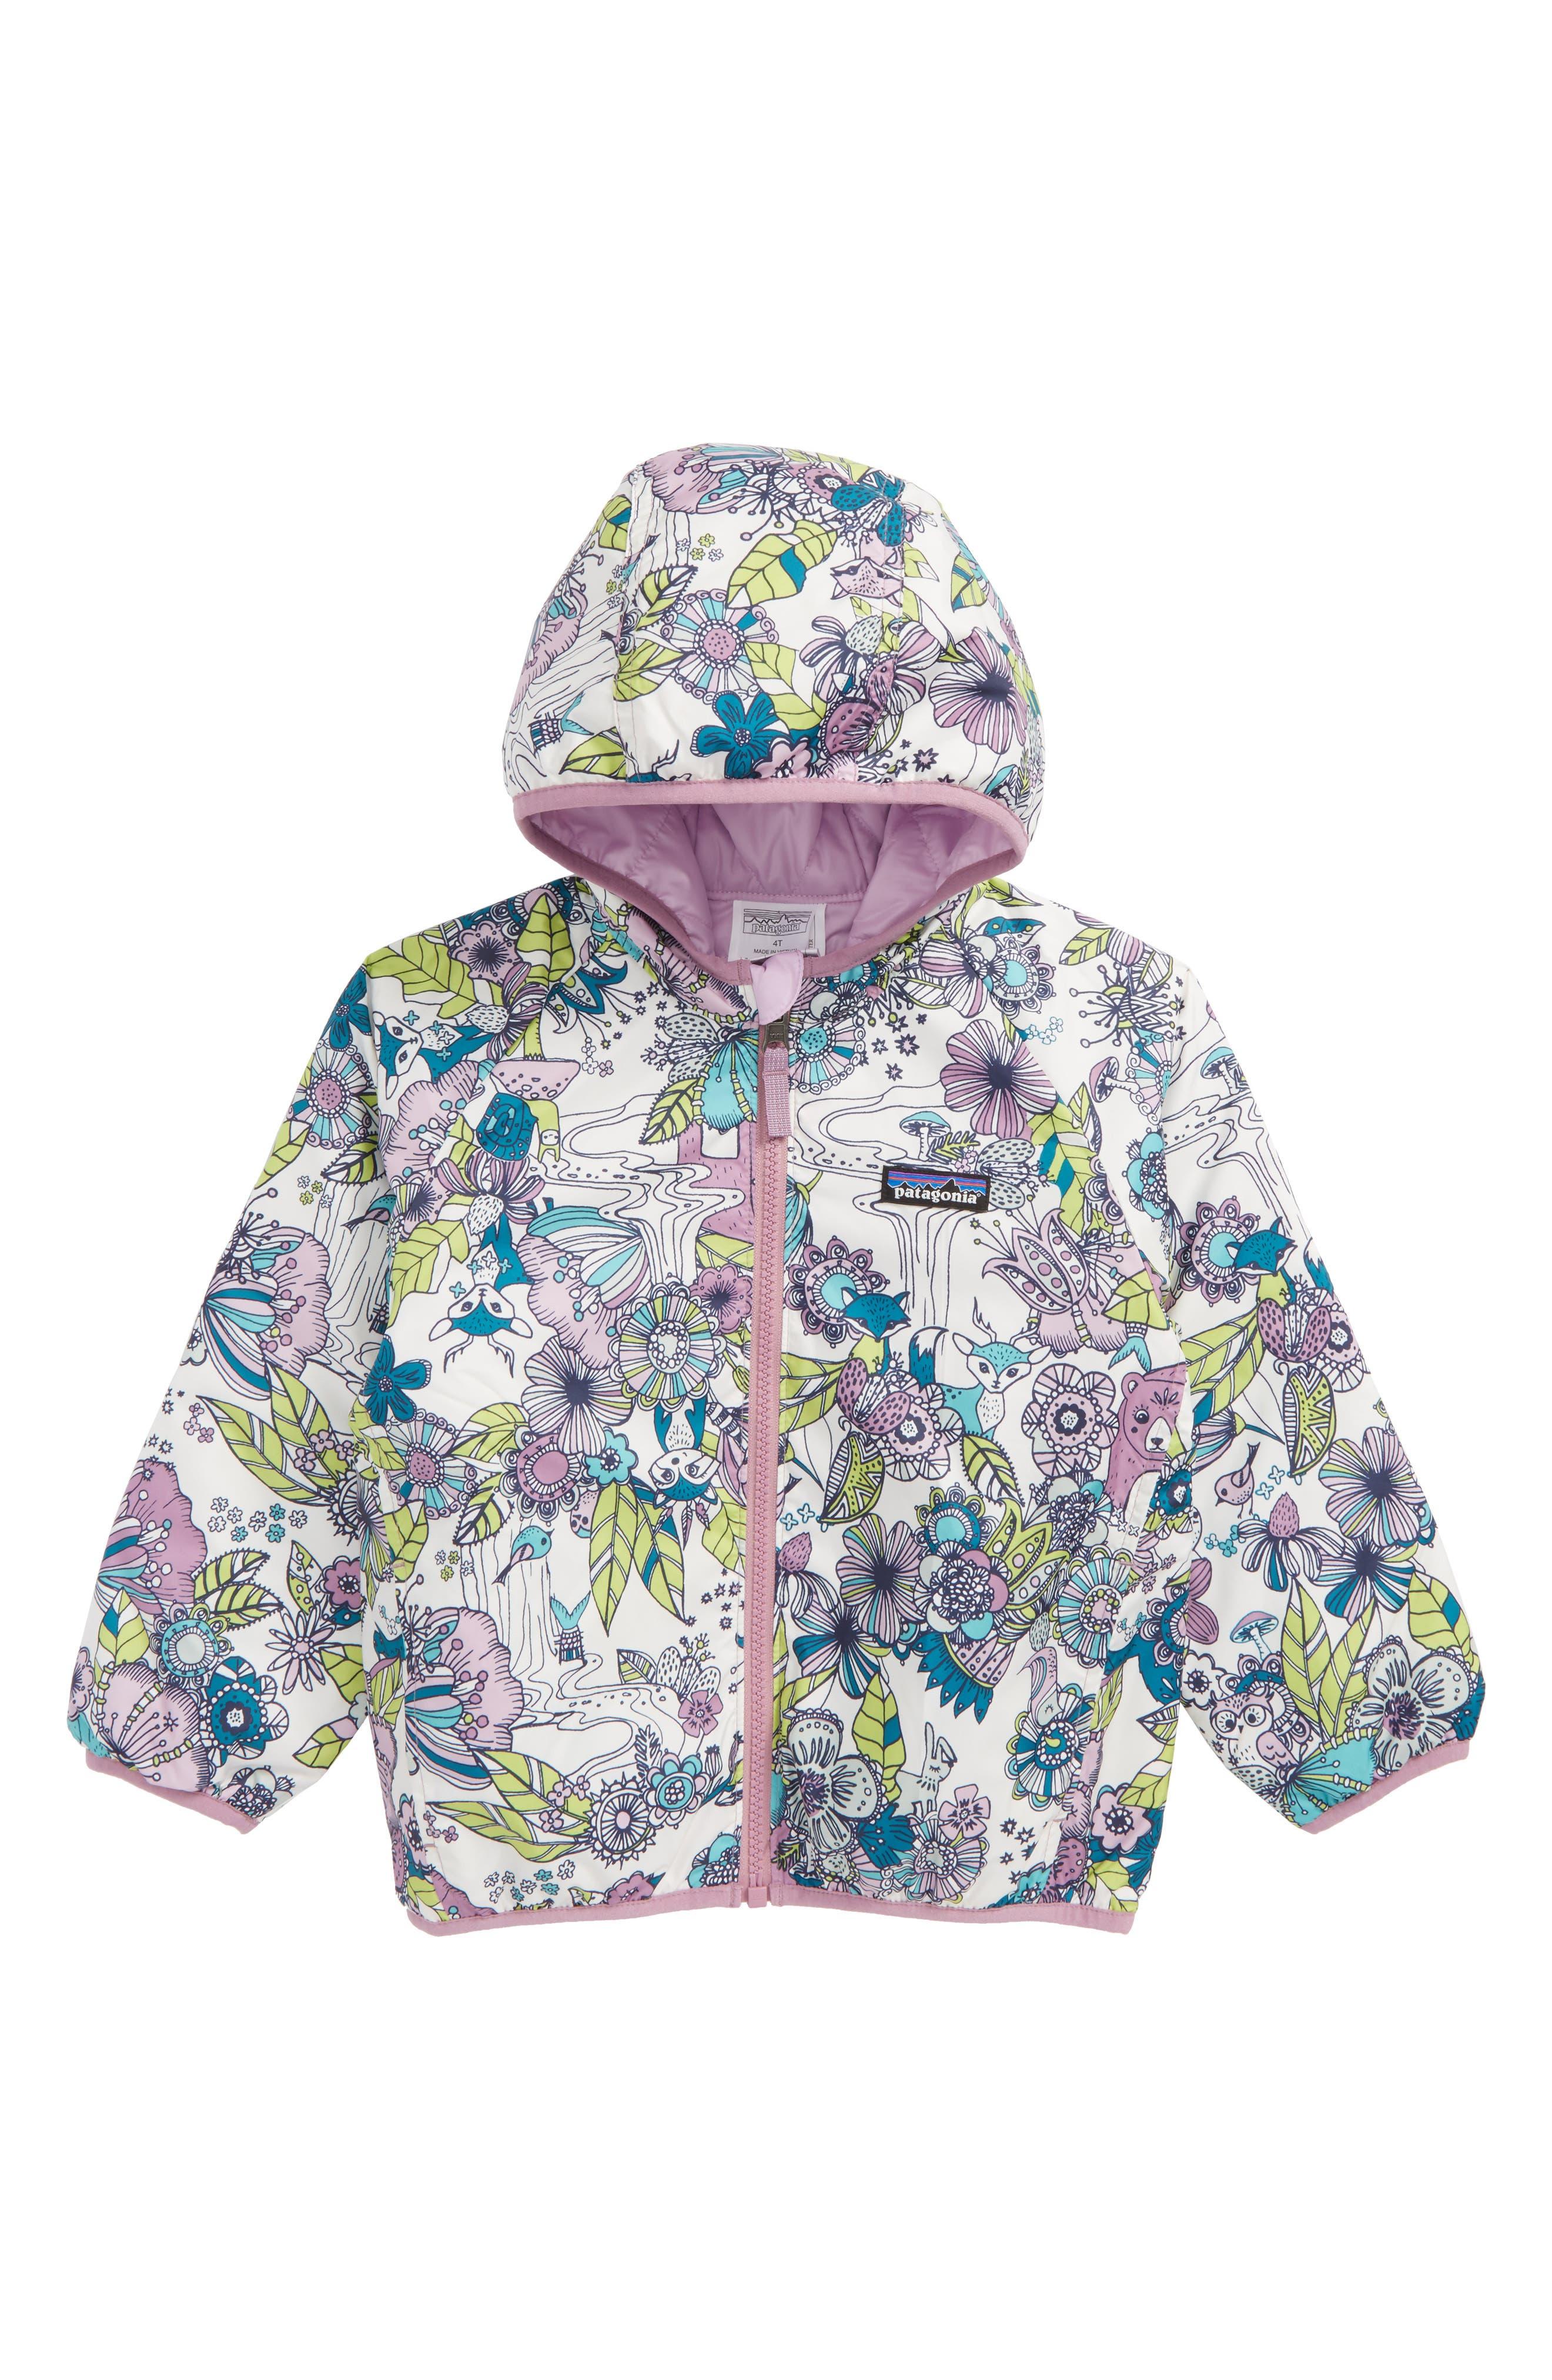 Main Image - Patagonia 'Puff-Ball' Water Resistant Reversible Hooded Jacket (Toddler Girls)